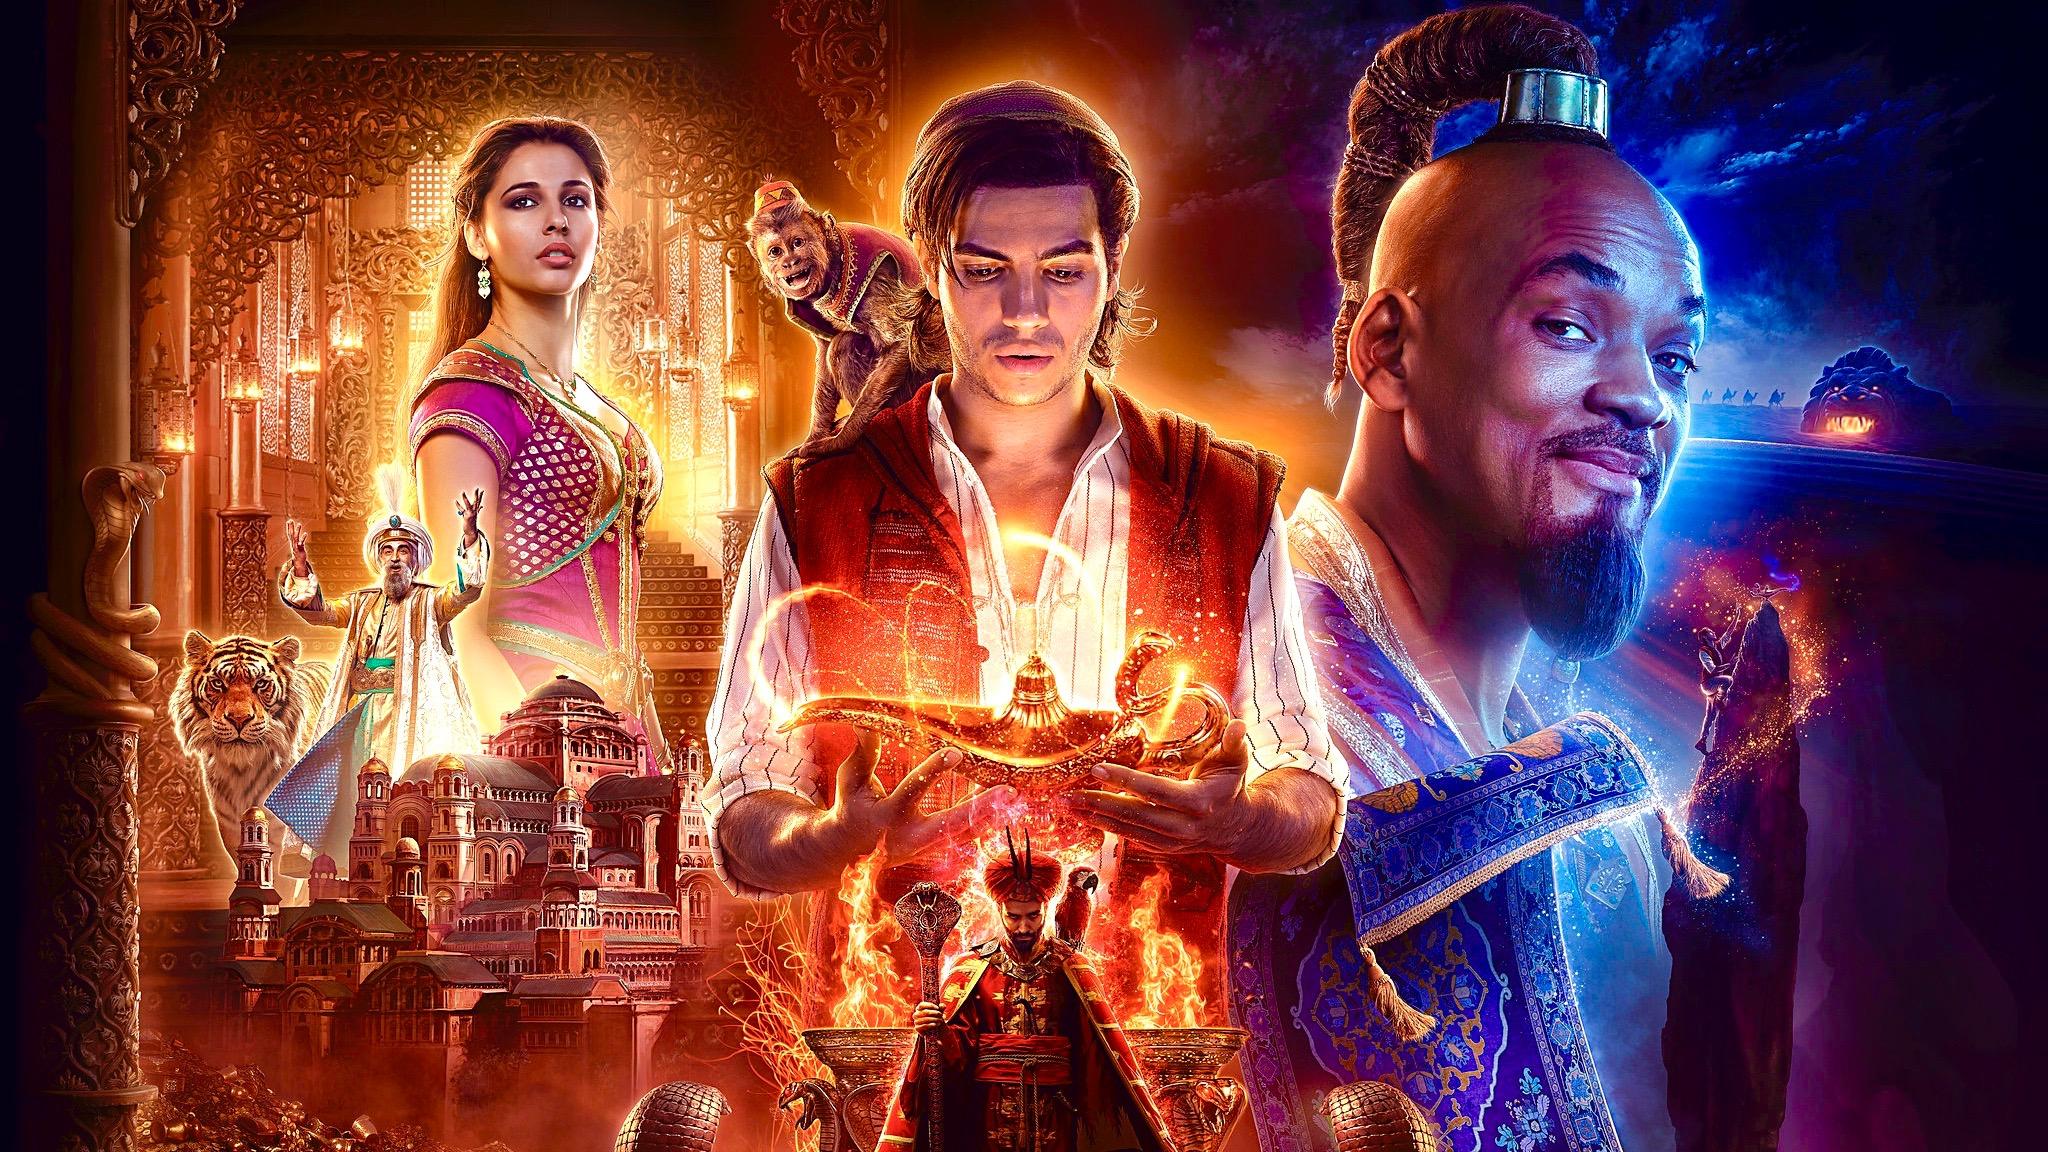 Aladdin 2019 HD Wallpaper Background Image 2048x1152 ID 2048x1152